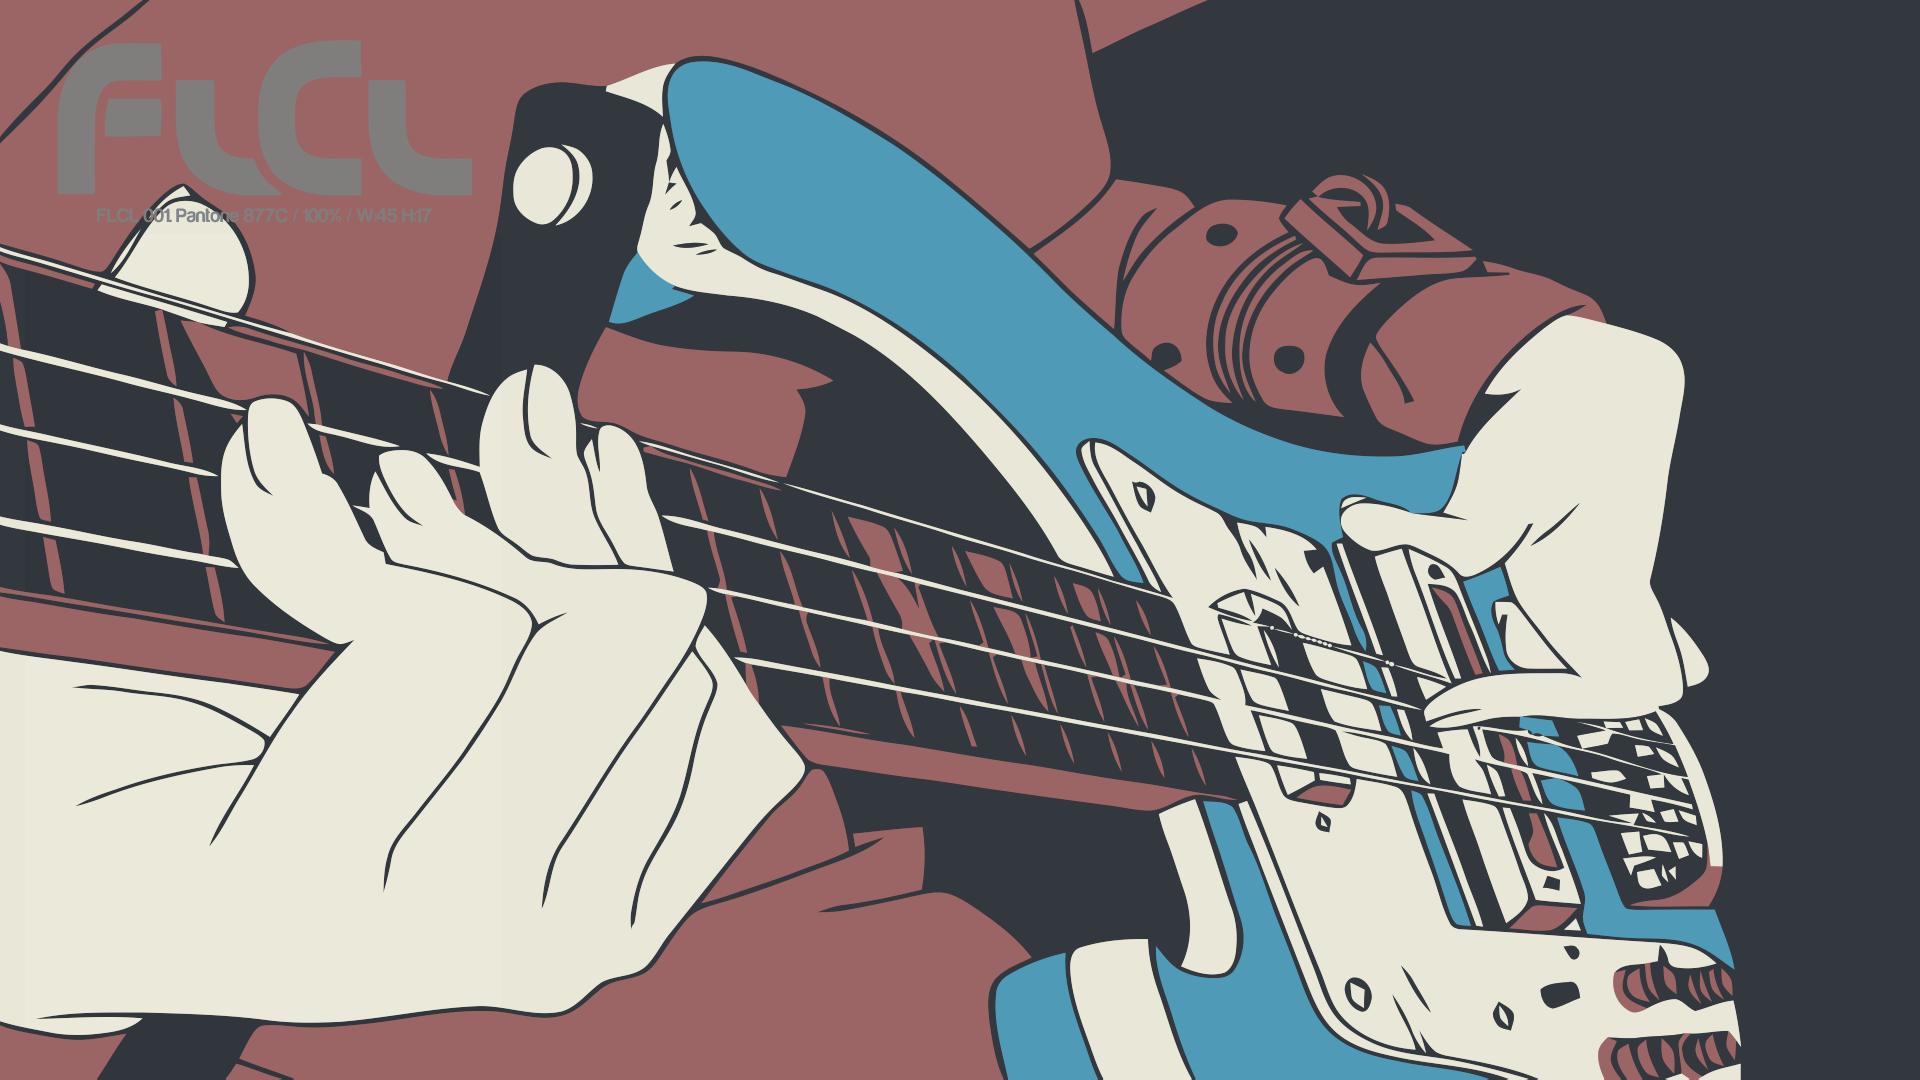 Wallpaper illustration anime musical instrument - Flcl wallpaper ...